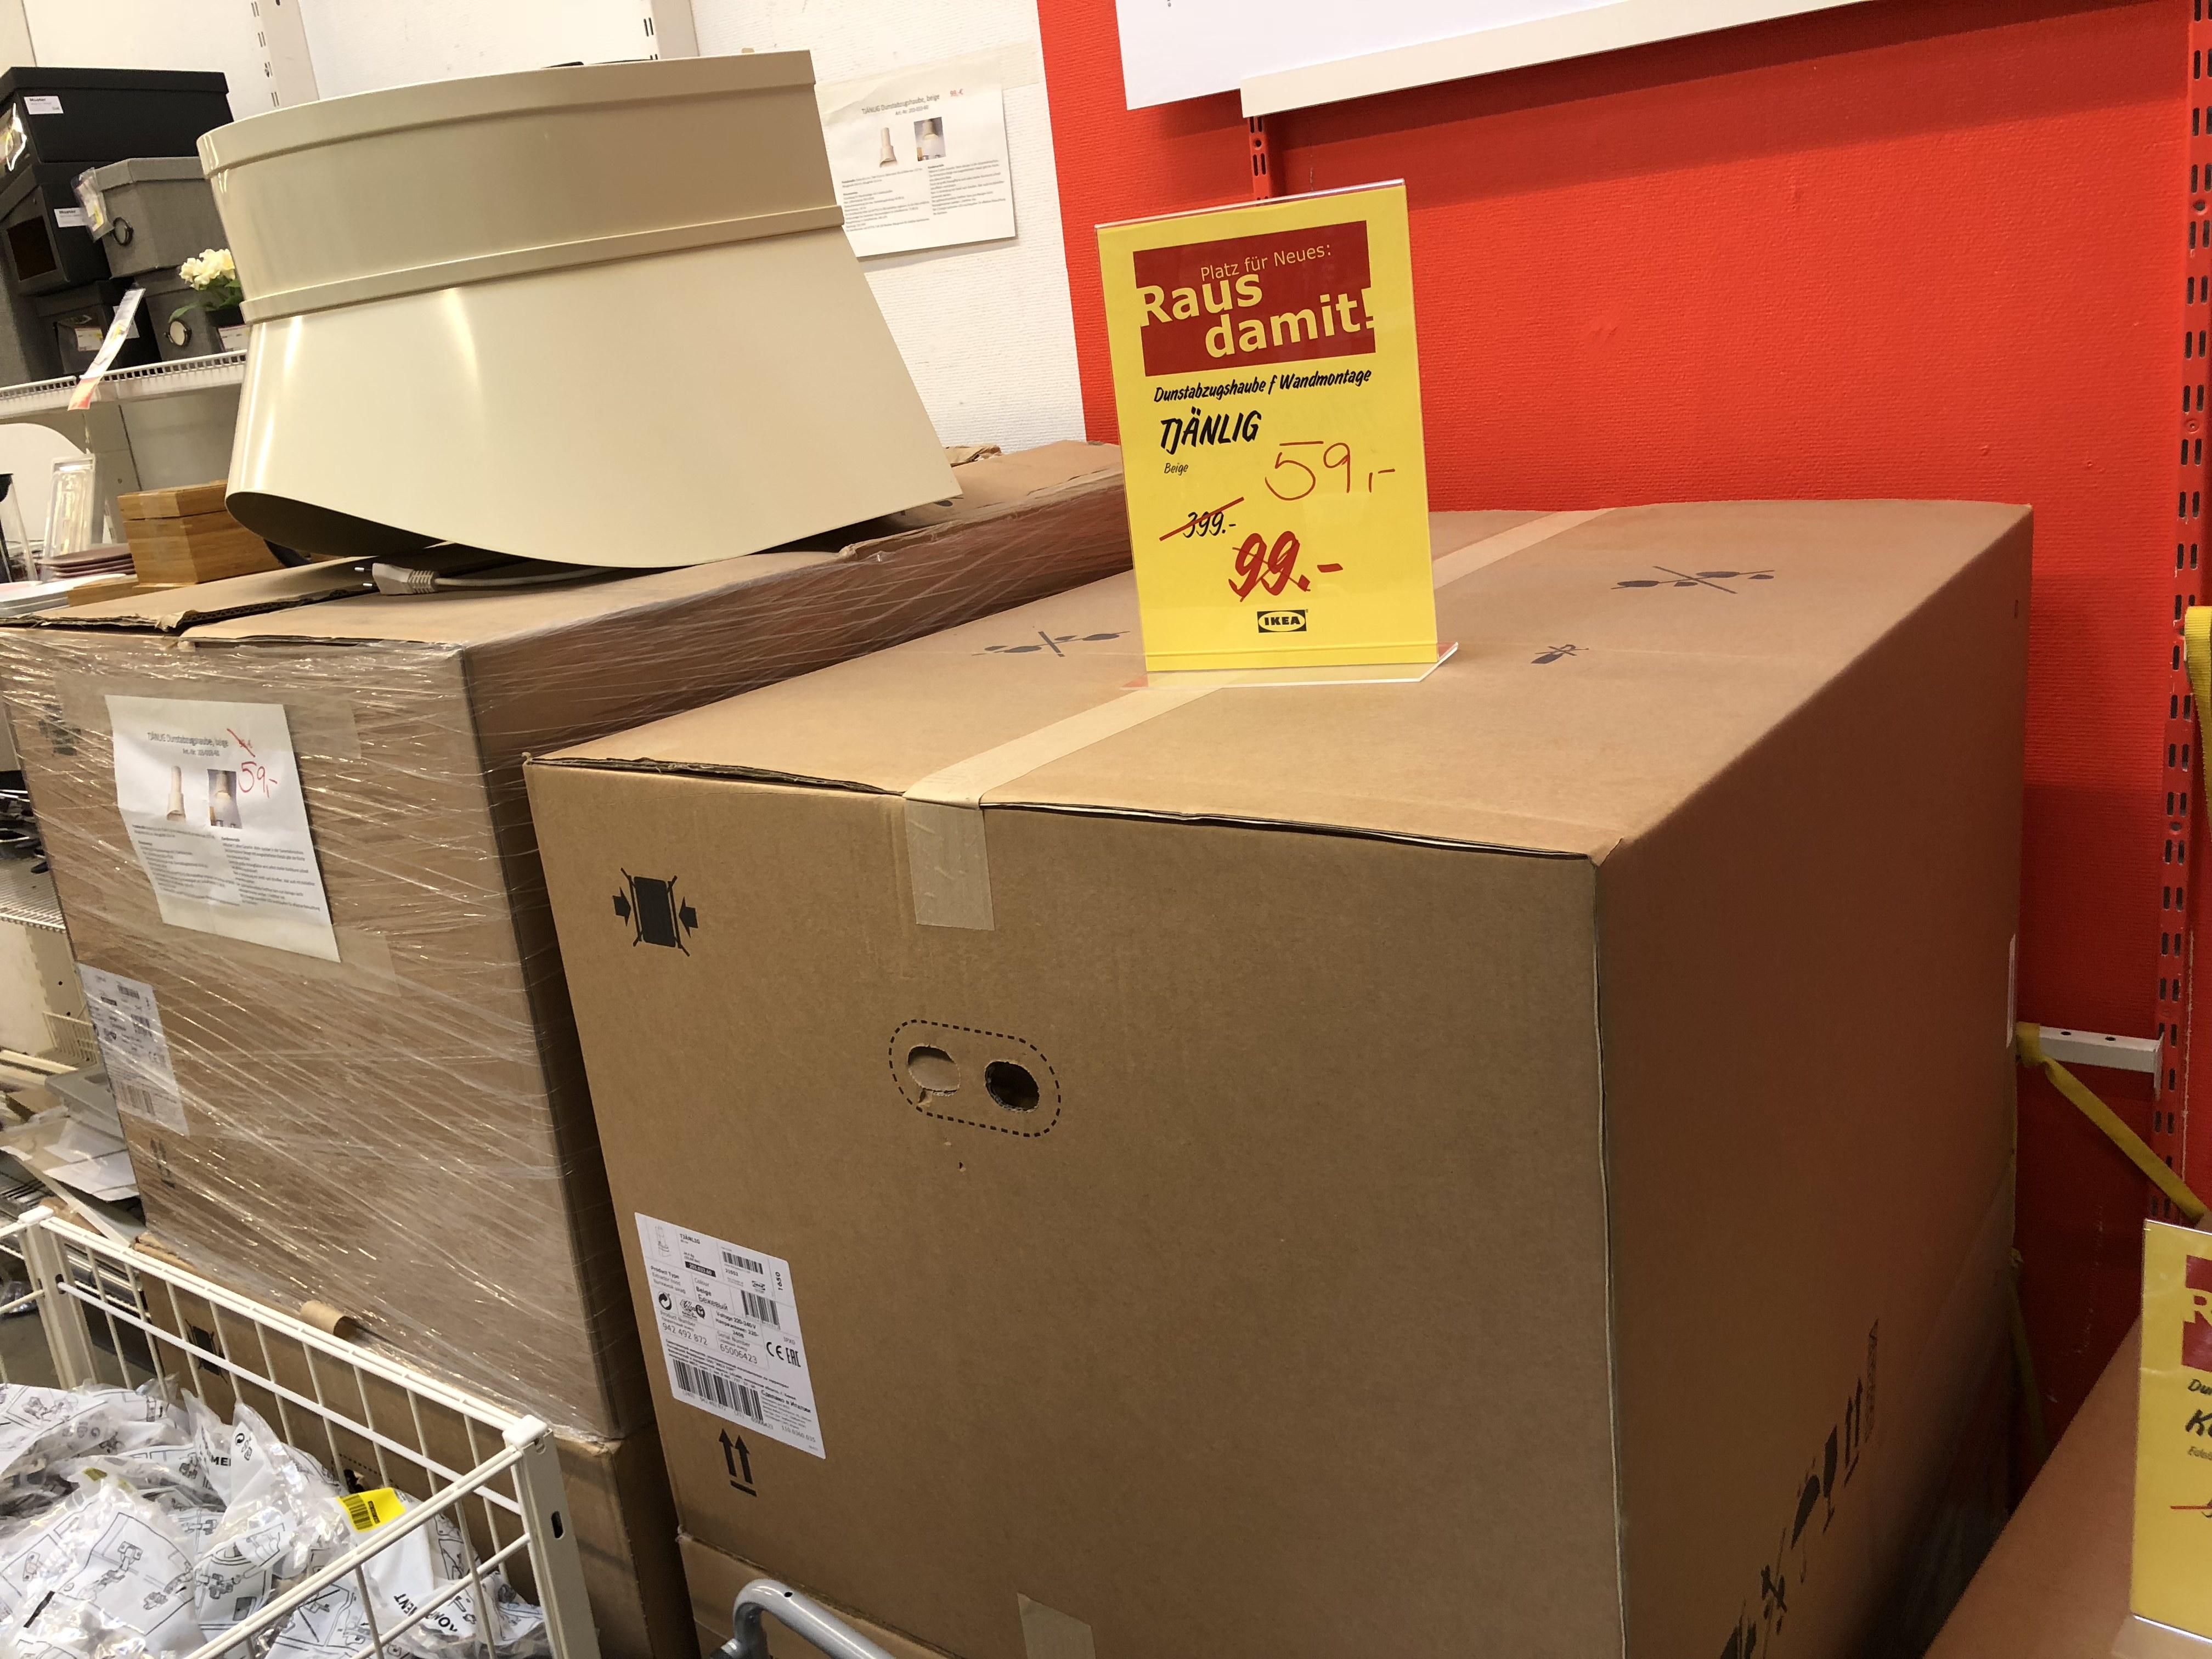 Ikea dunstabzugshaube xiaomi: dunstabzugshaube angebote schnäppchen